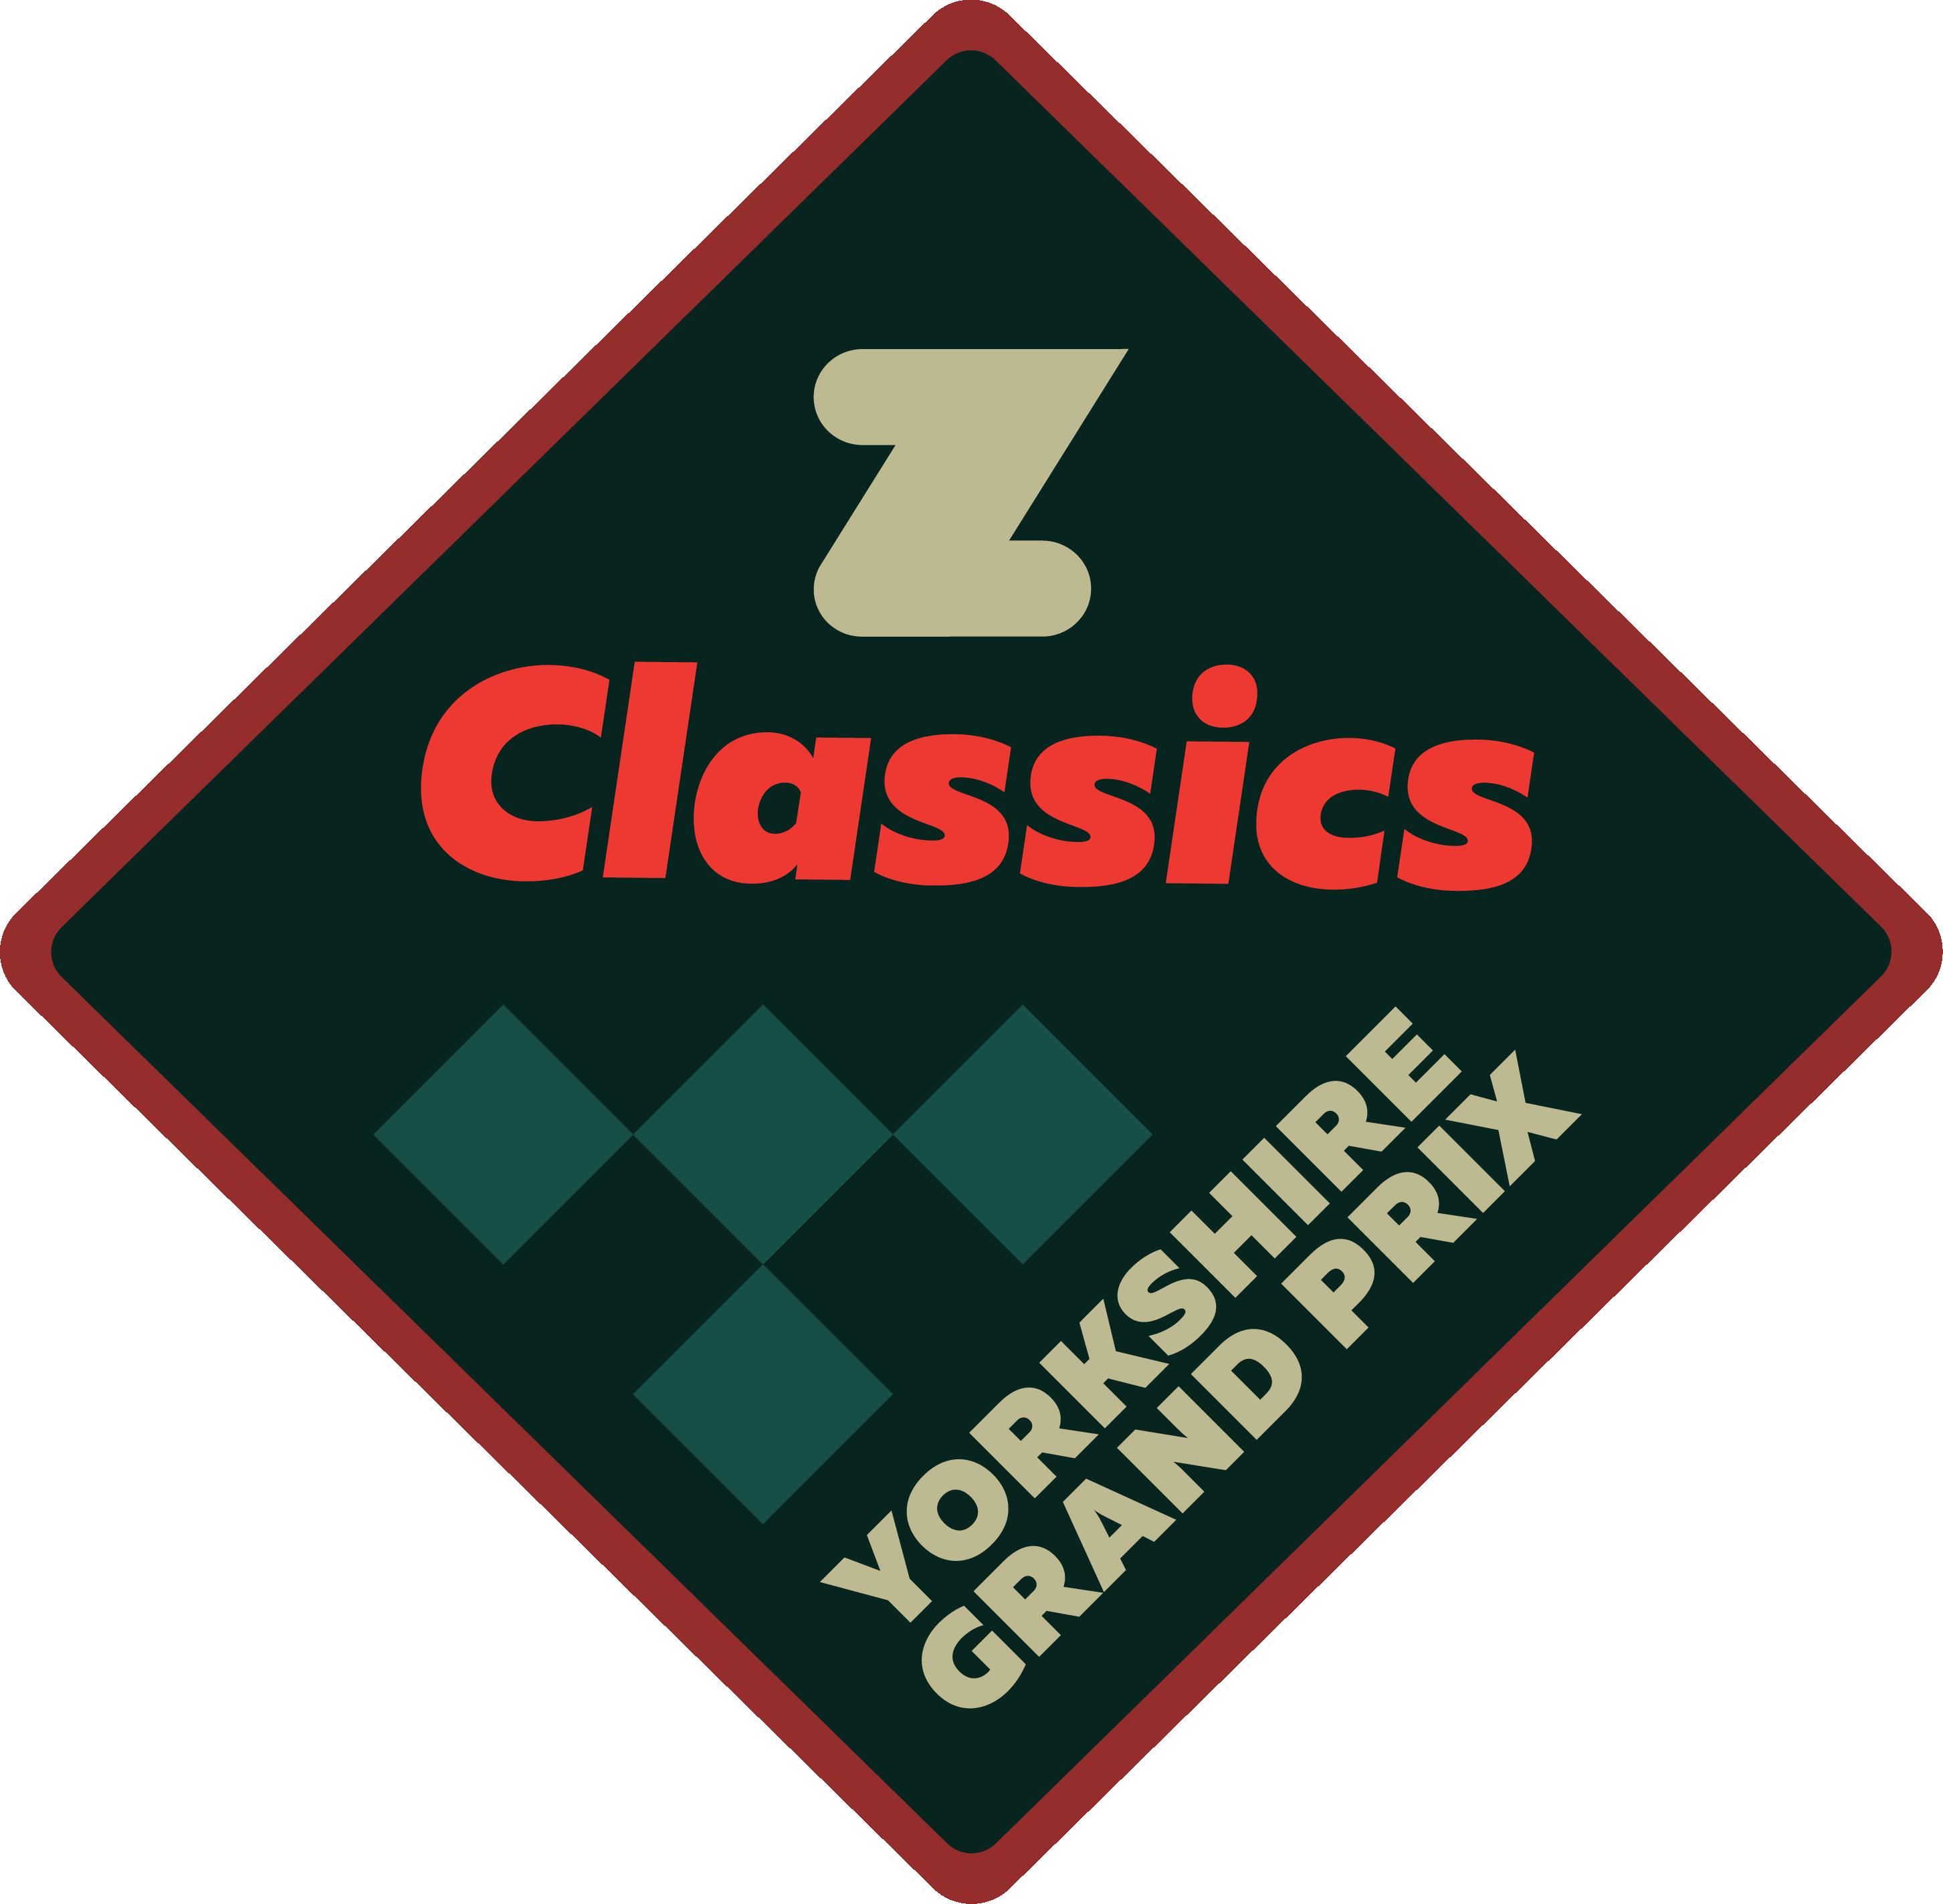 Zwift Classics Yorkshire Grand Prix